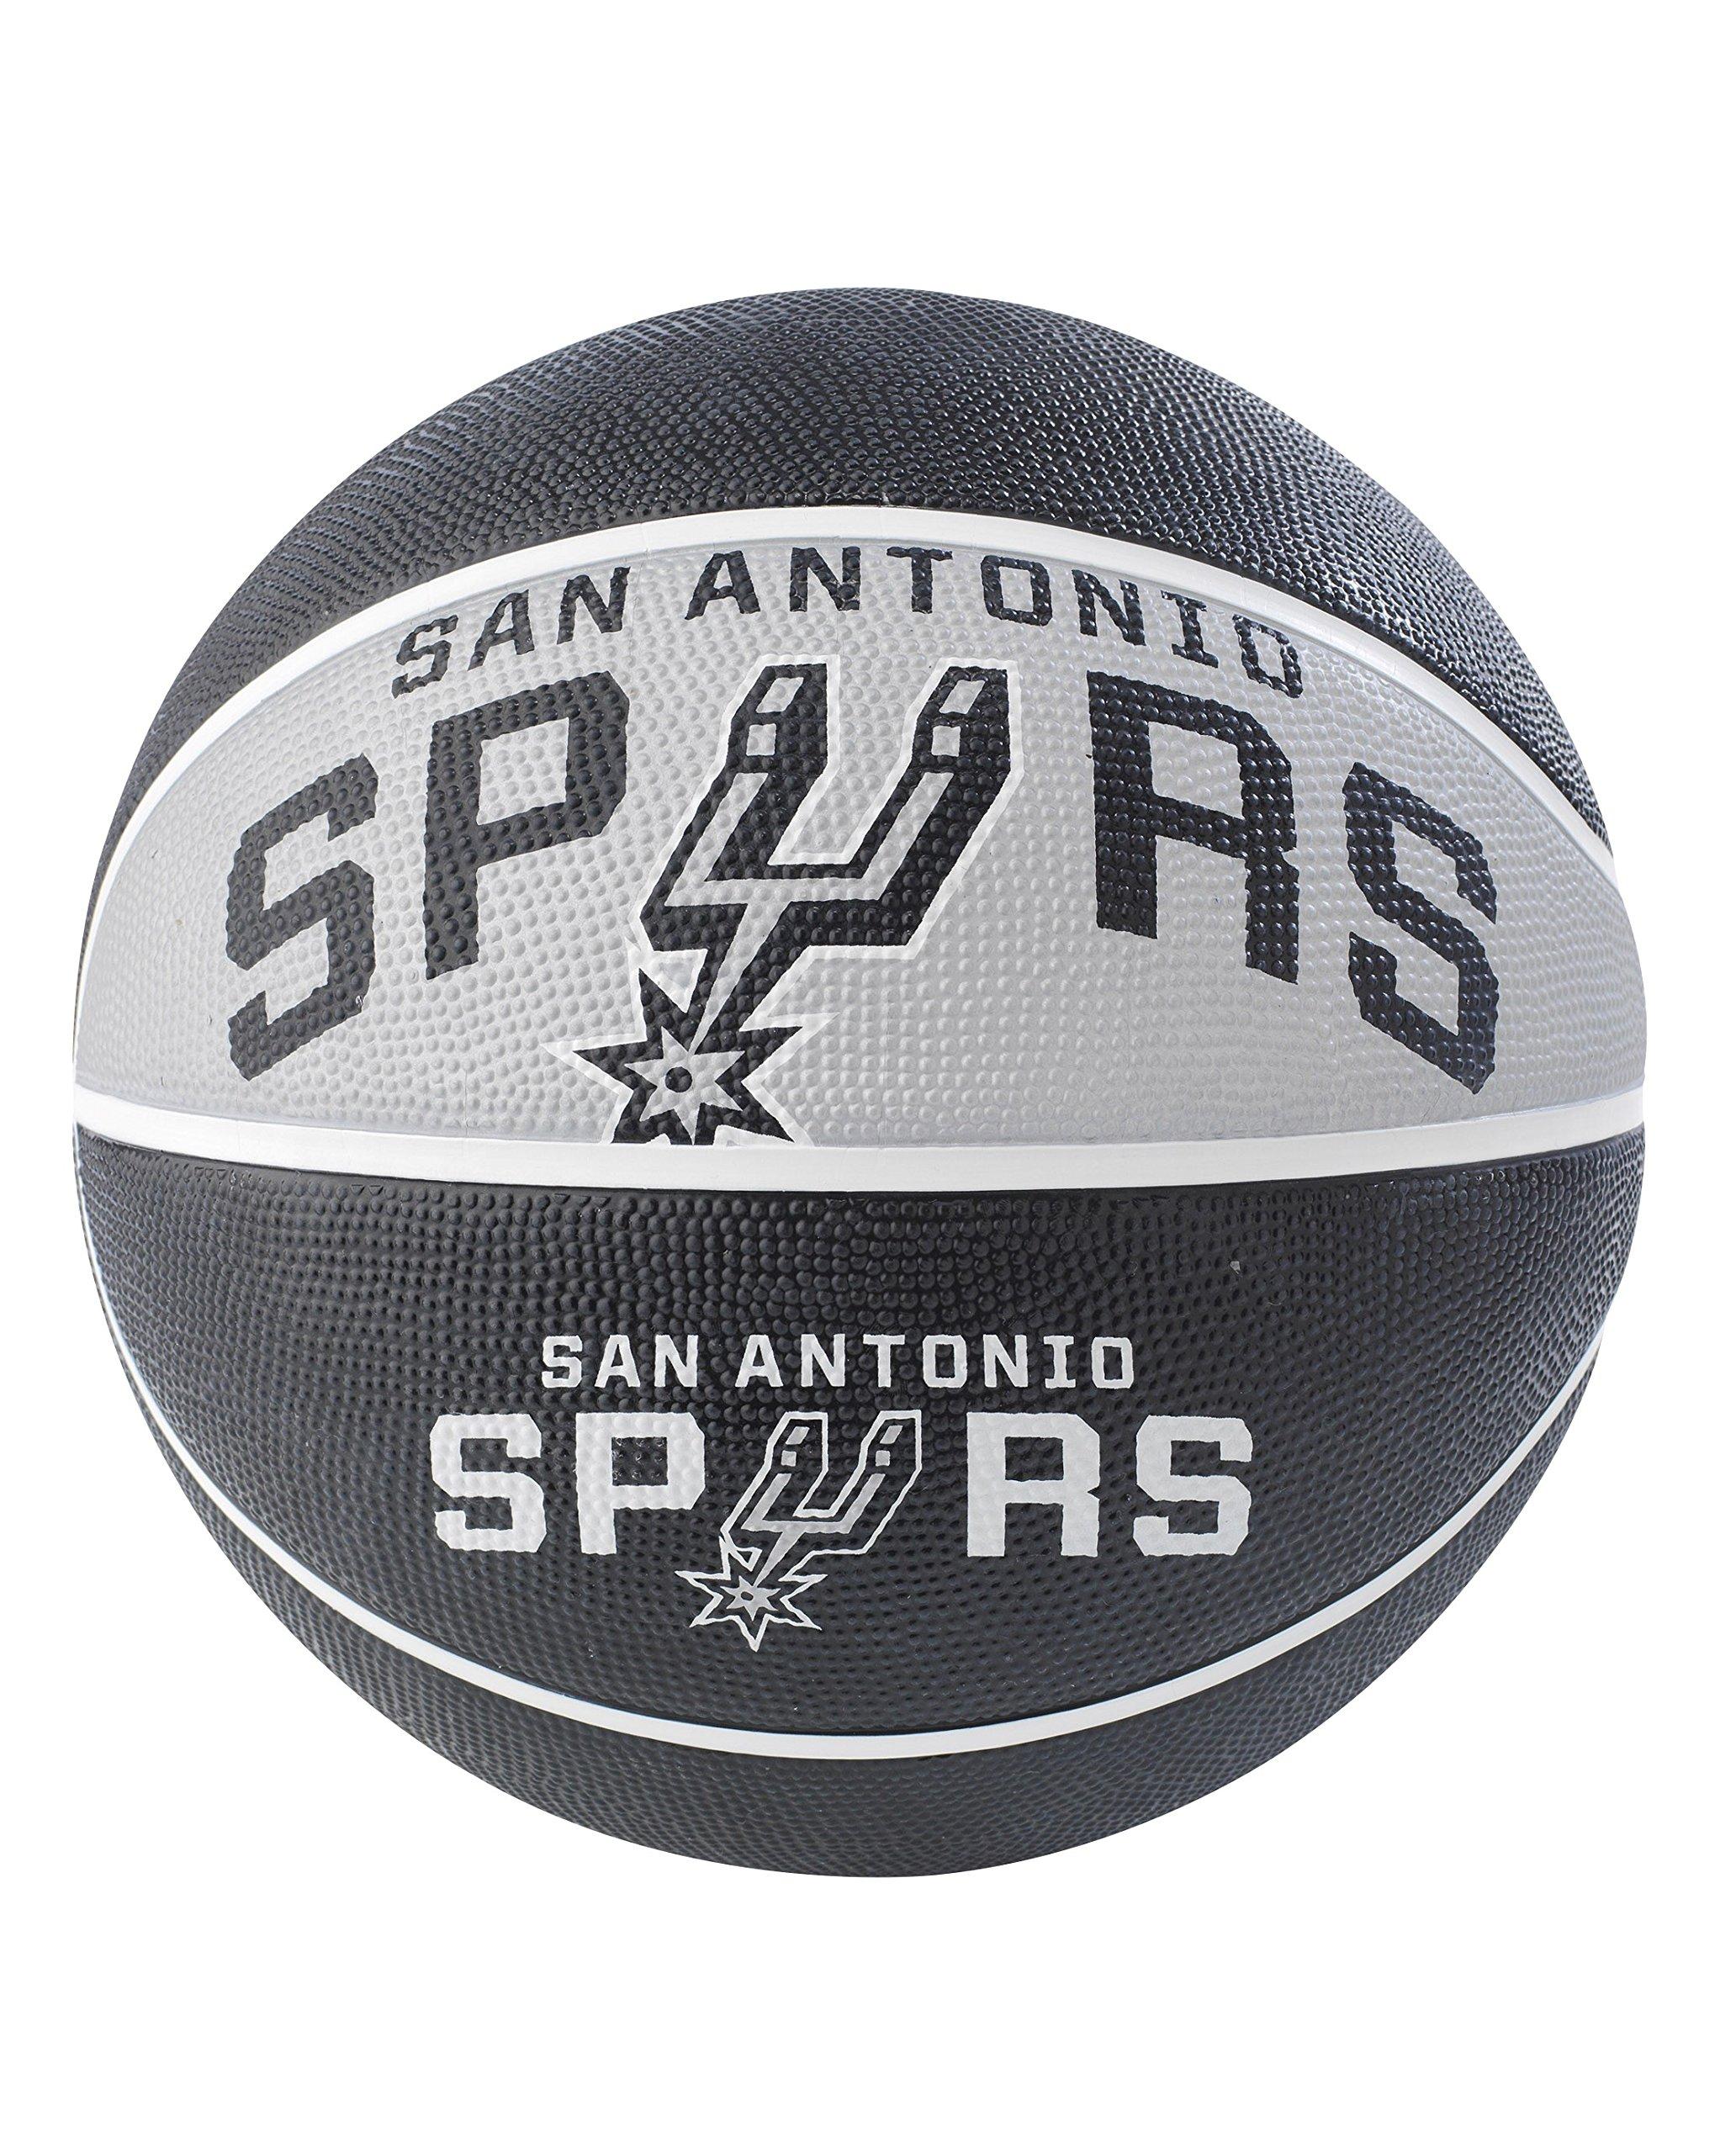 NBA San Antonio Spurs NBA Courtside Team Outdoor Rubber Basketballteam Logo, Black, 29.5''